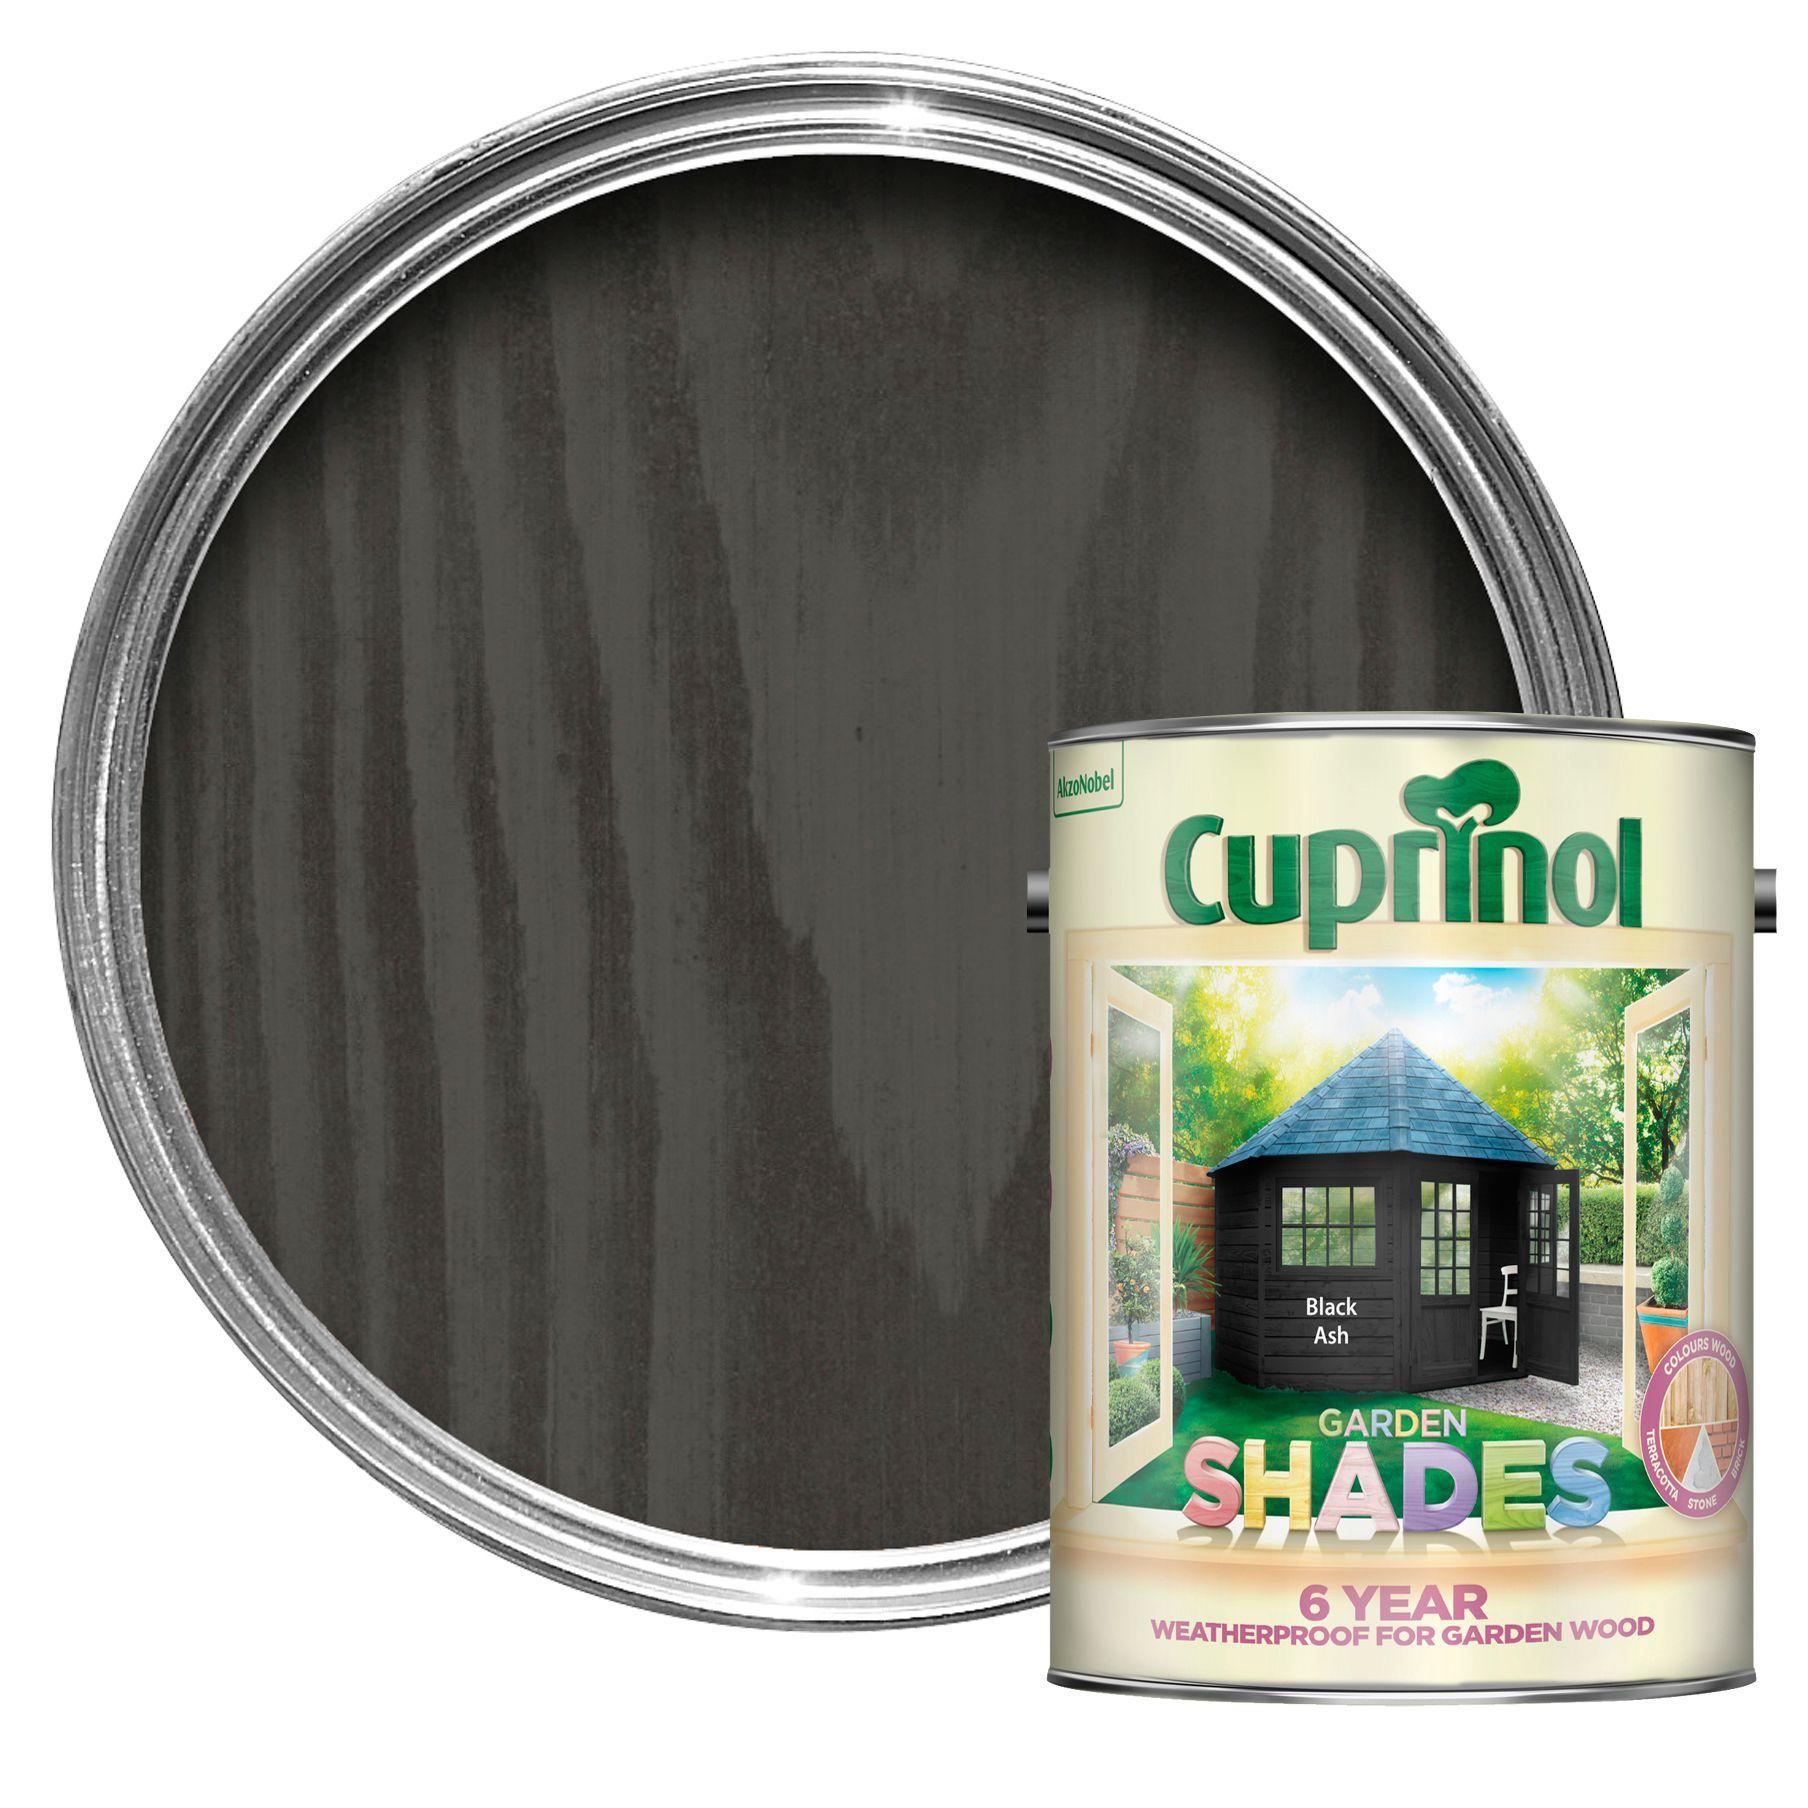 Cuprinol Garden Shades Black Ash Matt Wood Paint 5l Departments Diy At B Q